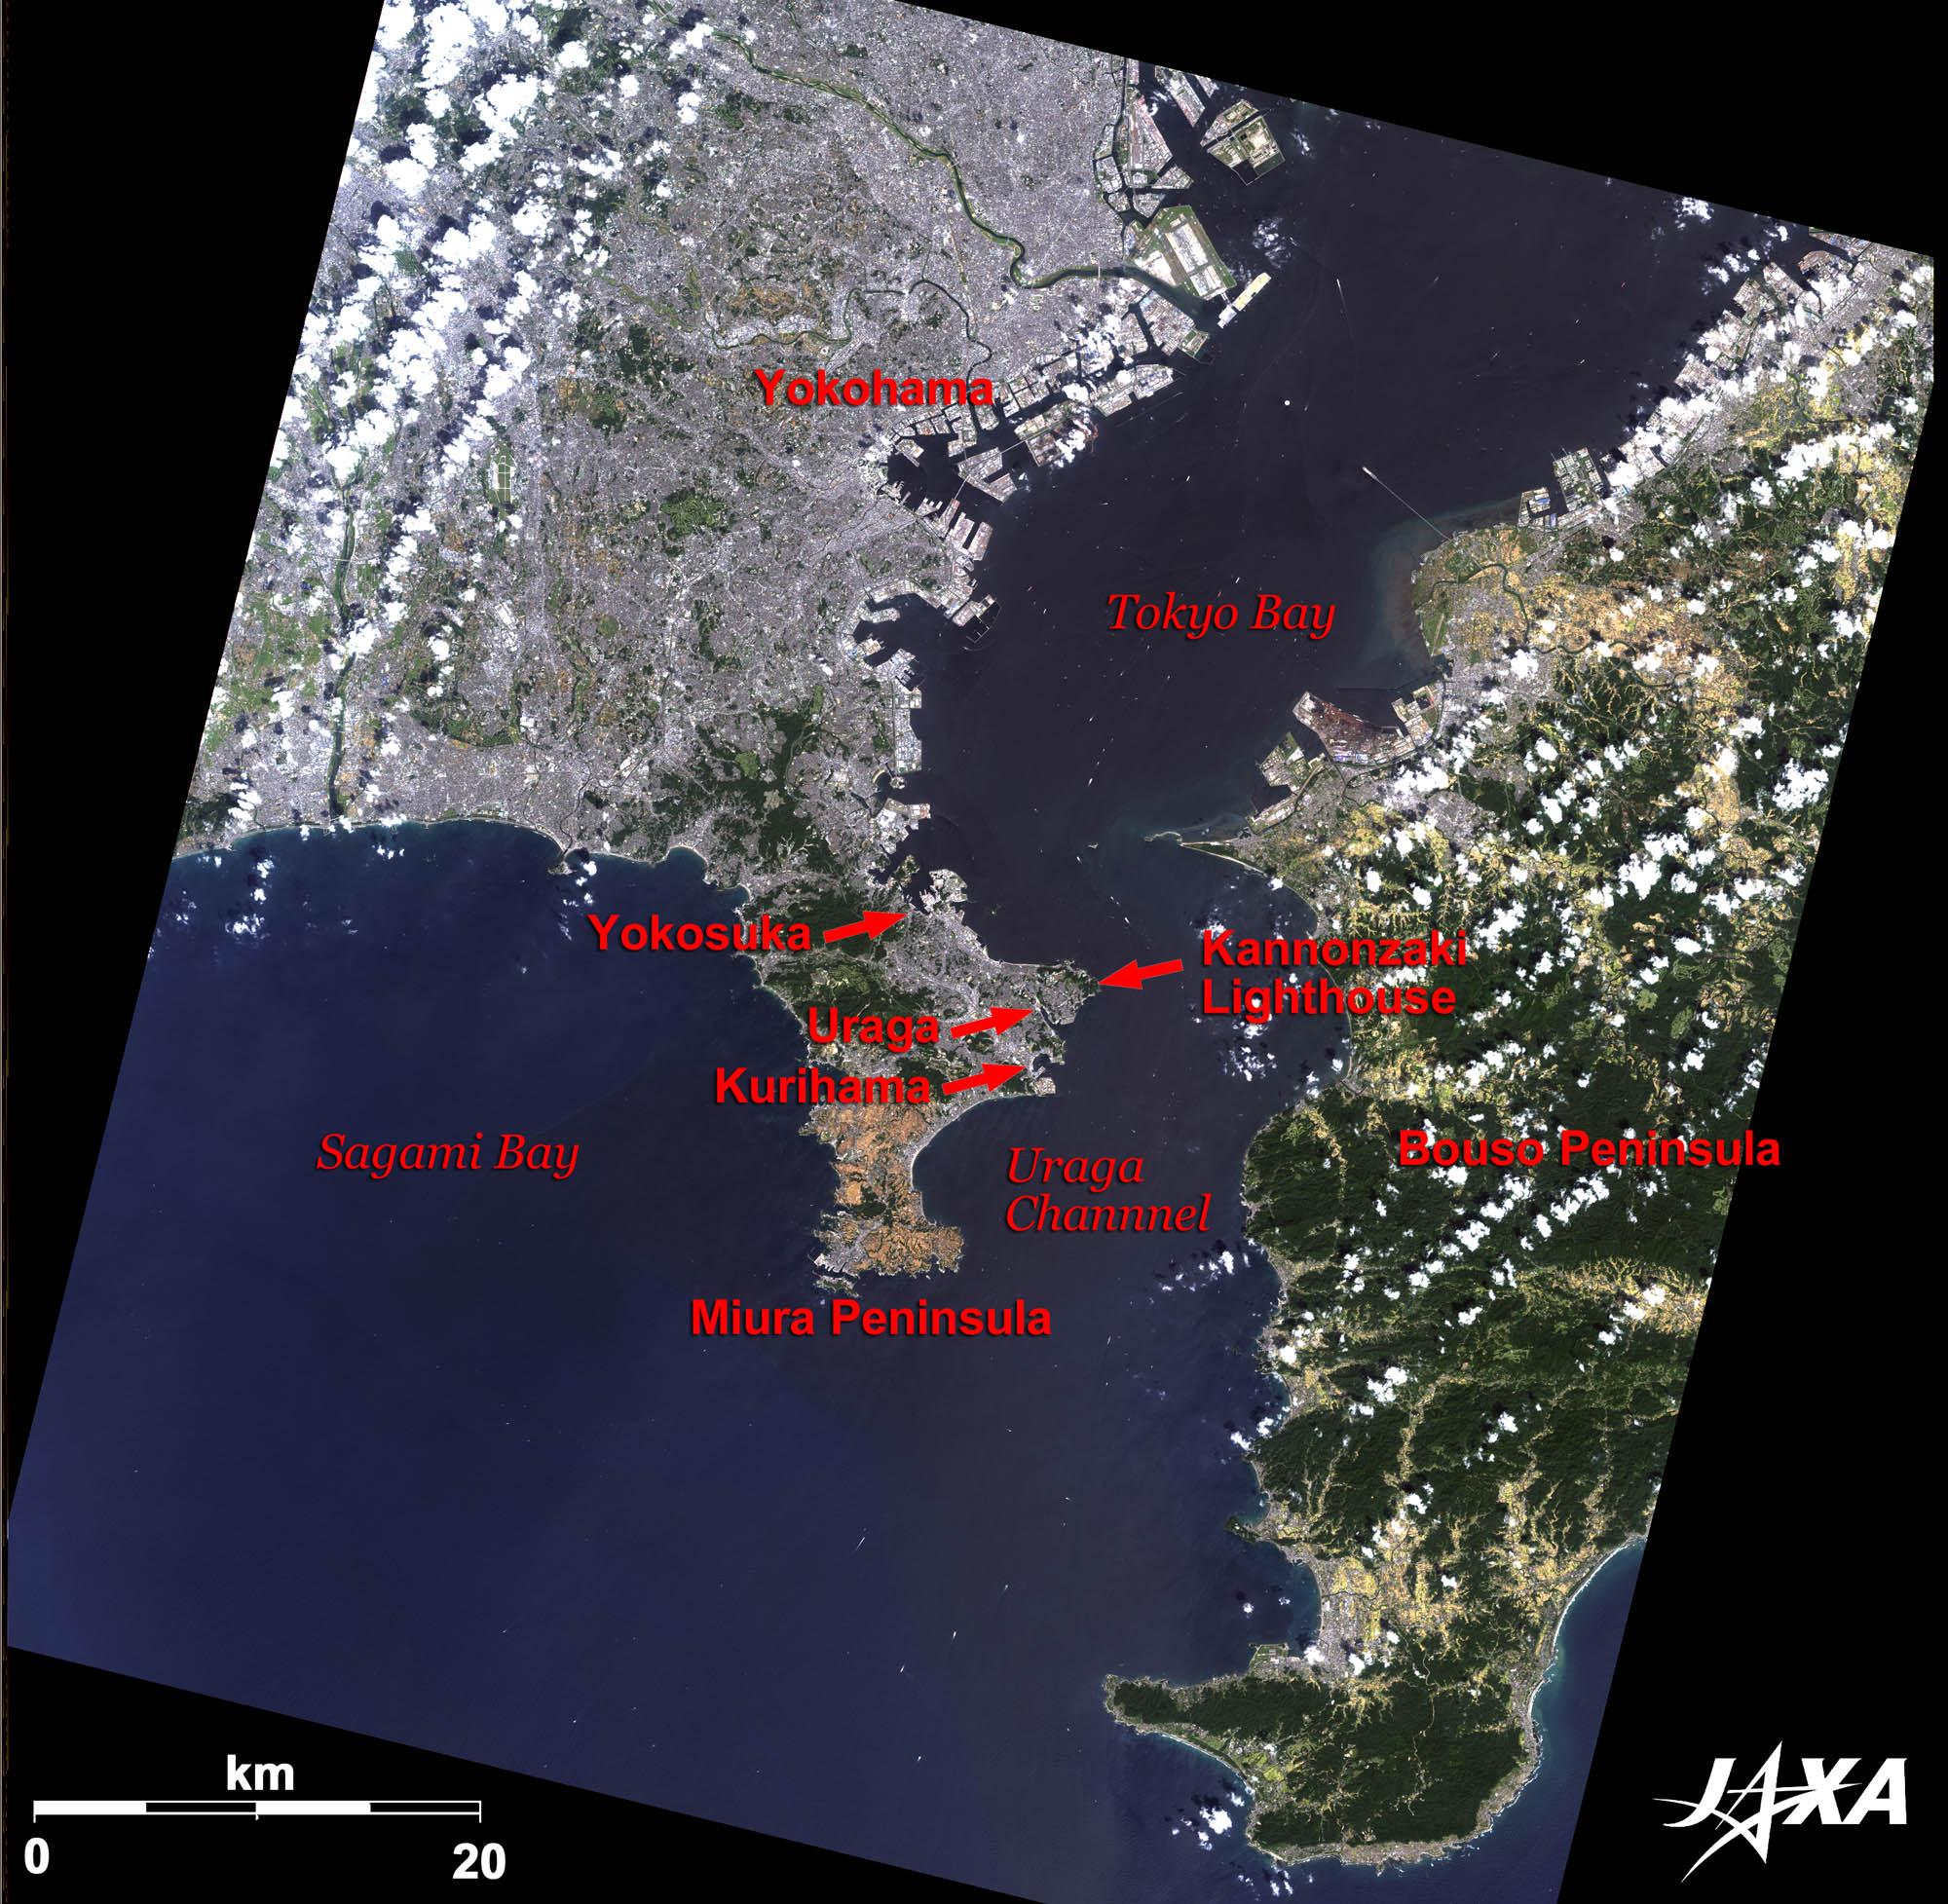 Uraga And Yokosuka Japan 2010 Jaxa Earth Observation Research